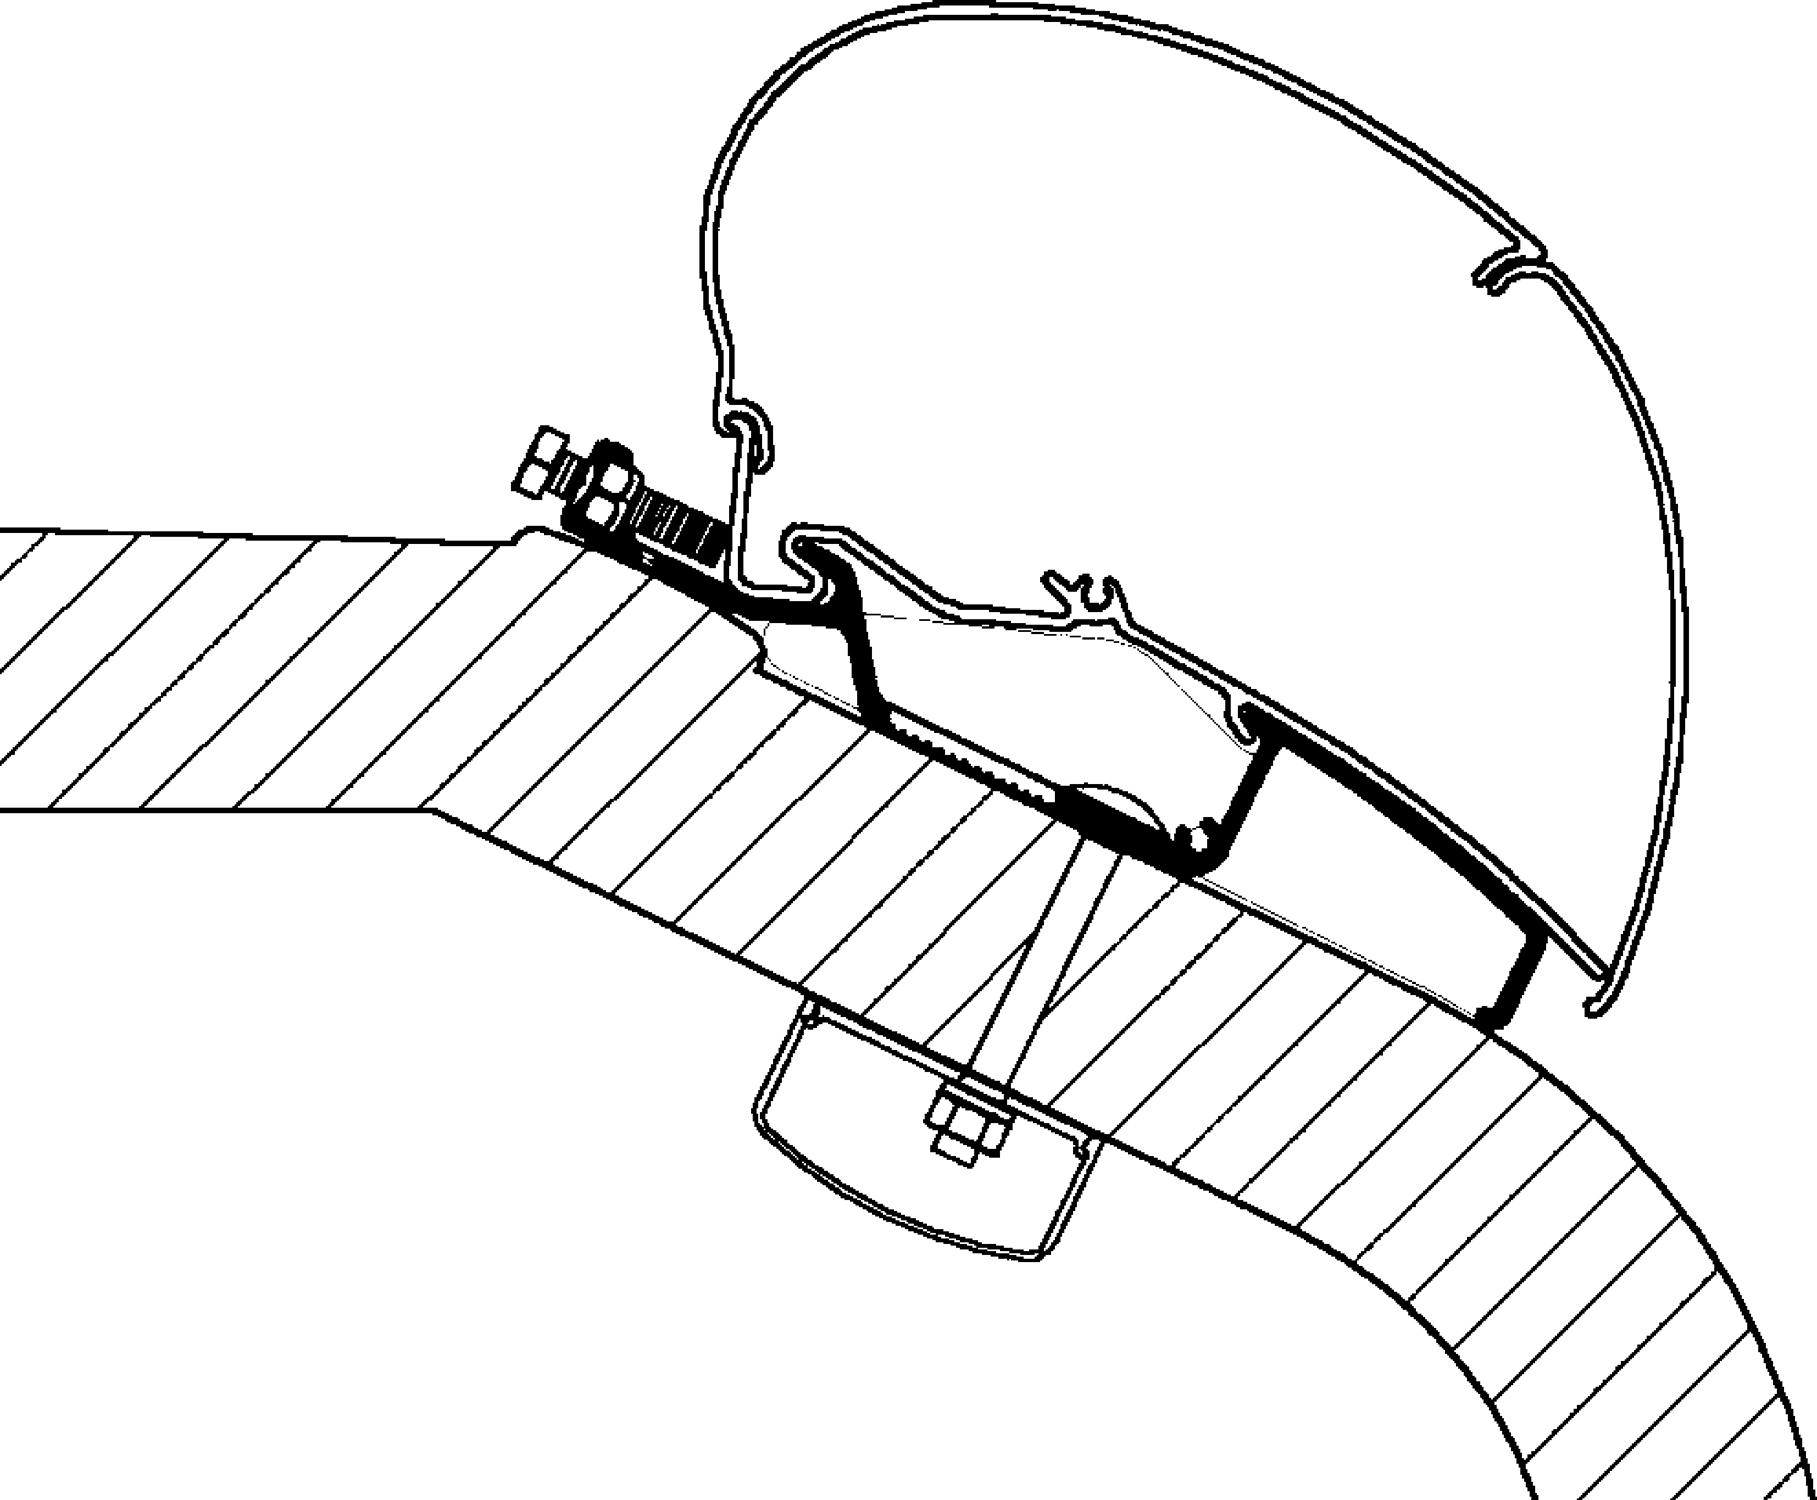 Levně Thule Střešní adaptér LMC Liberty TI / TEC pro markýzy Thule Omnistor 5,5 m